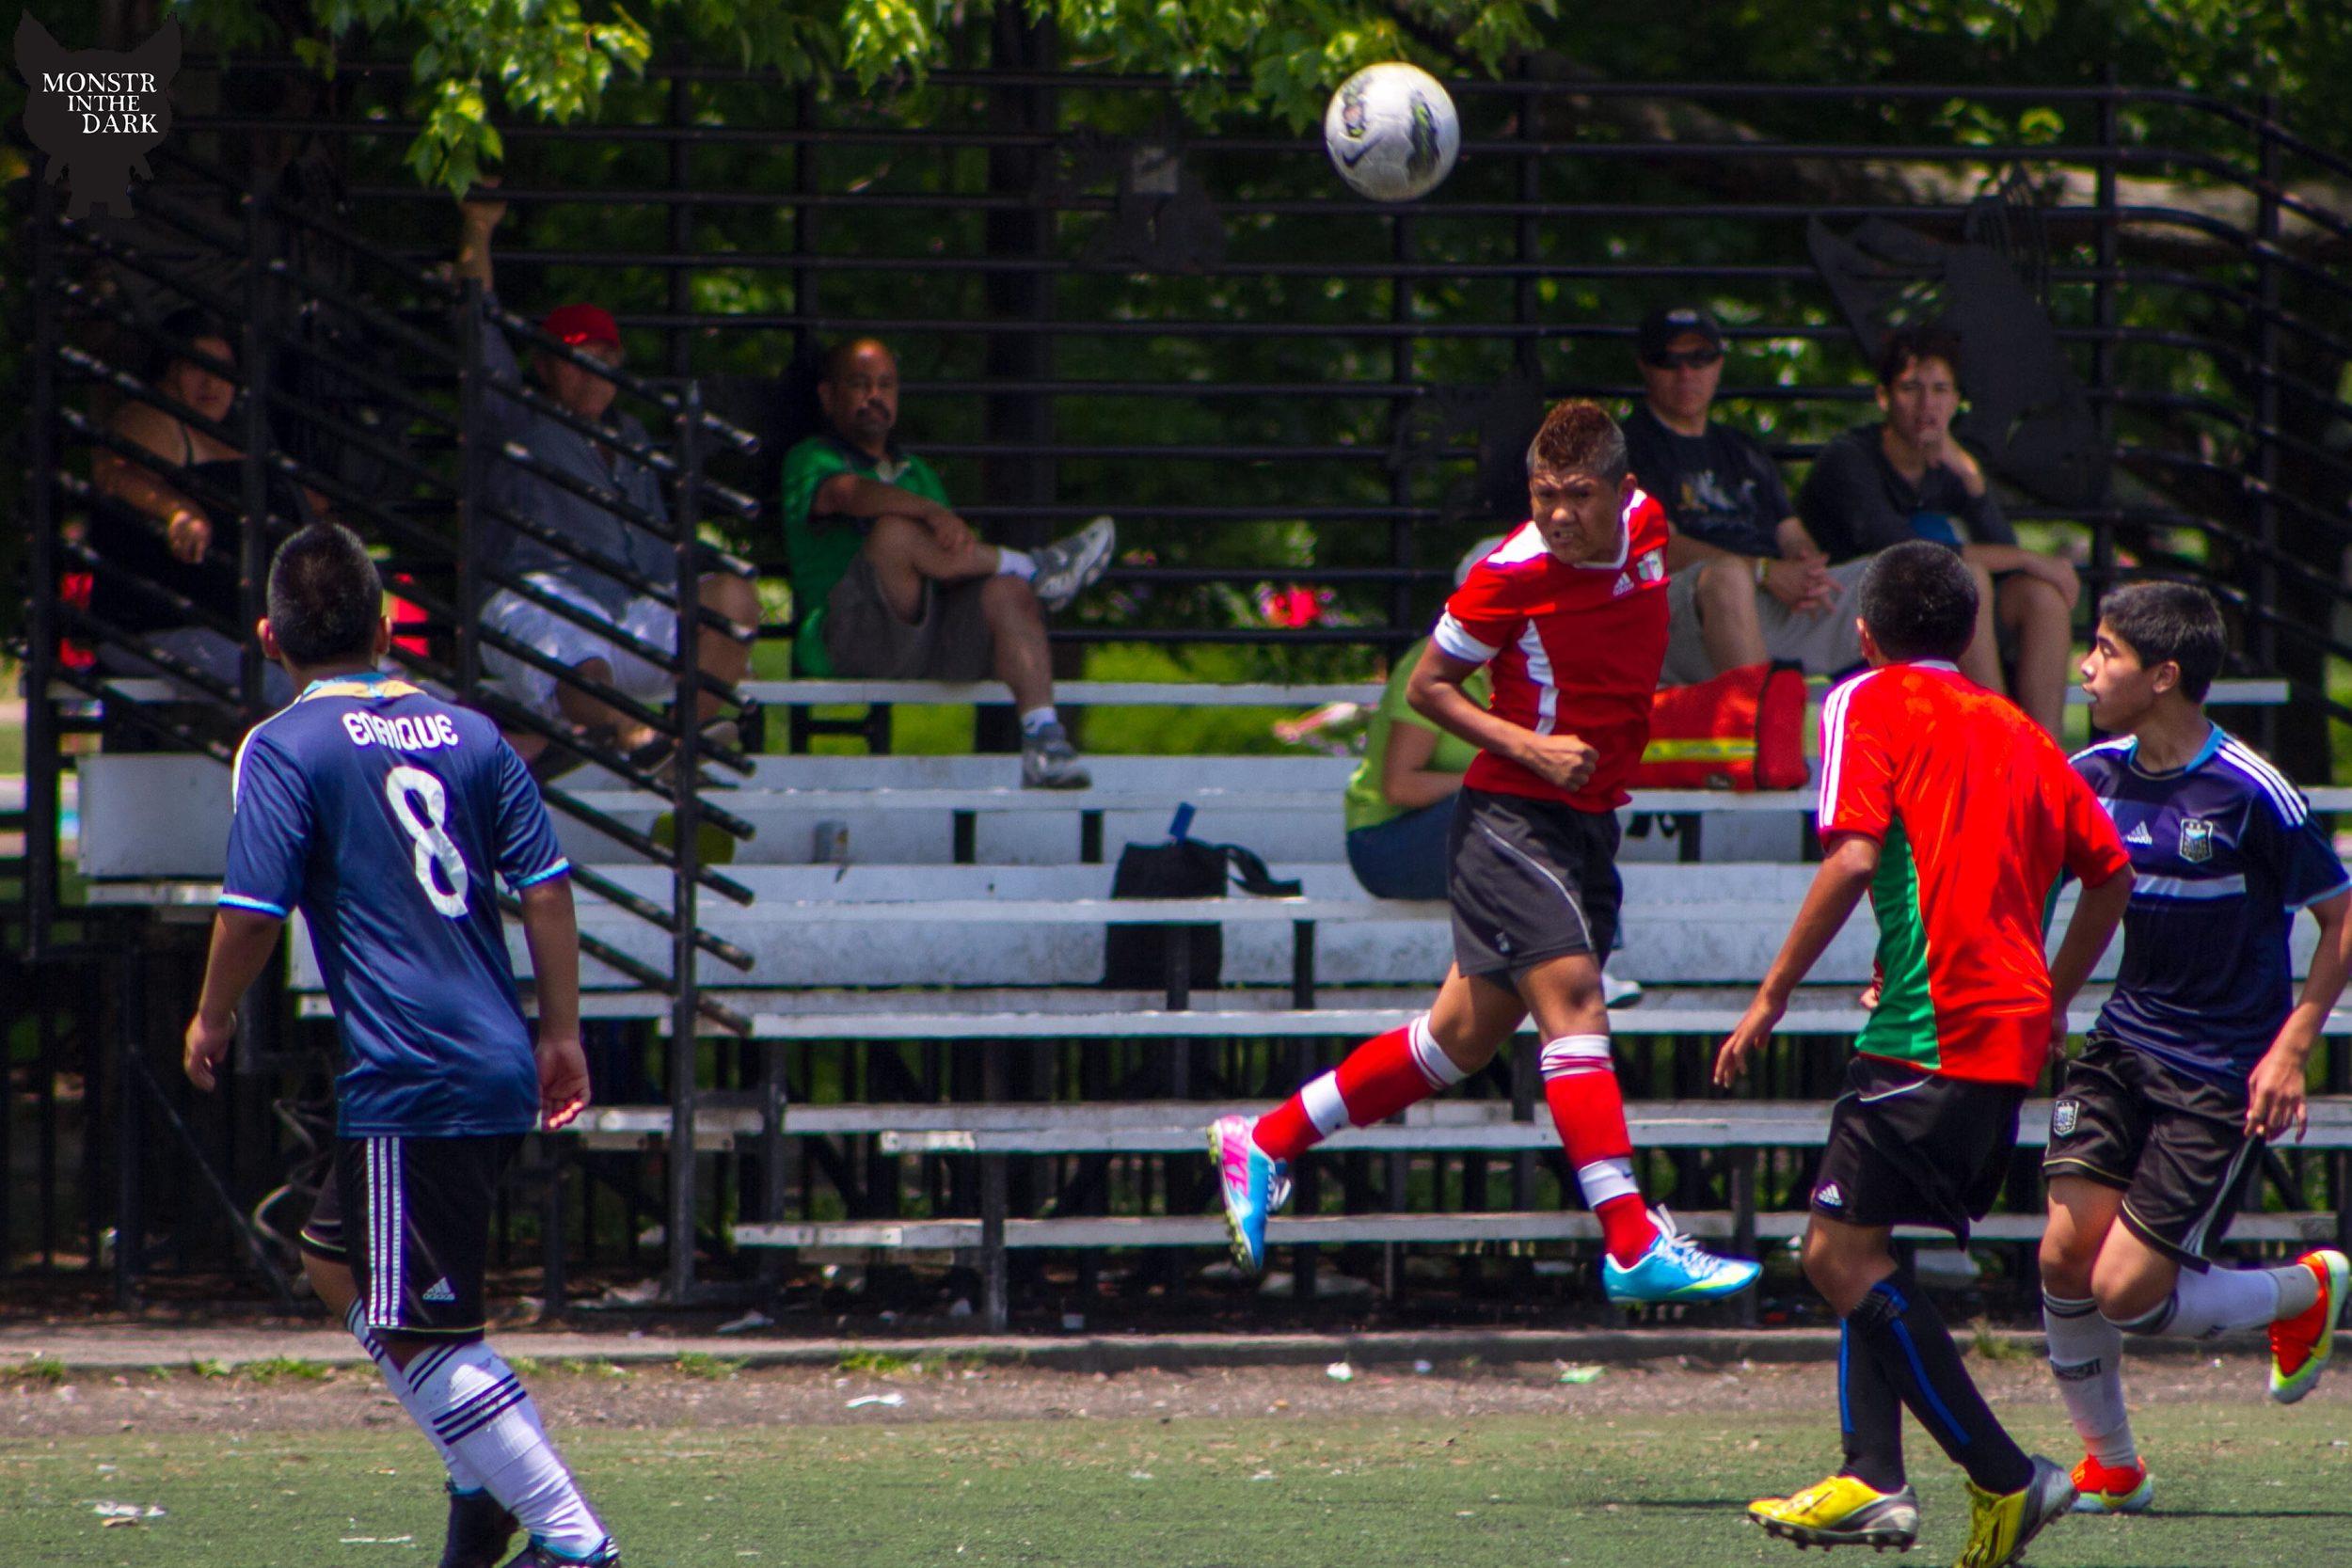 soccer_header2.jpg